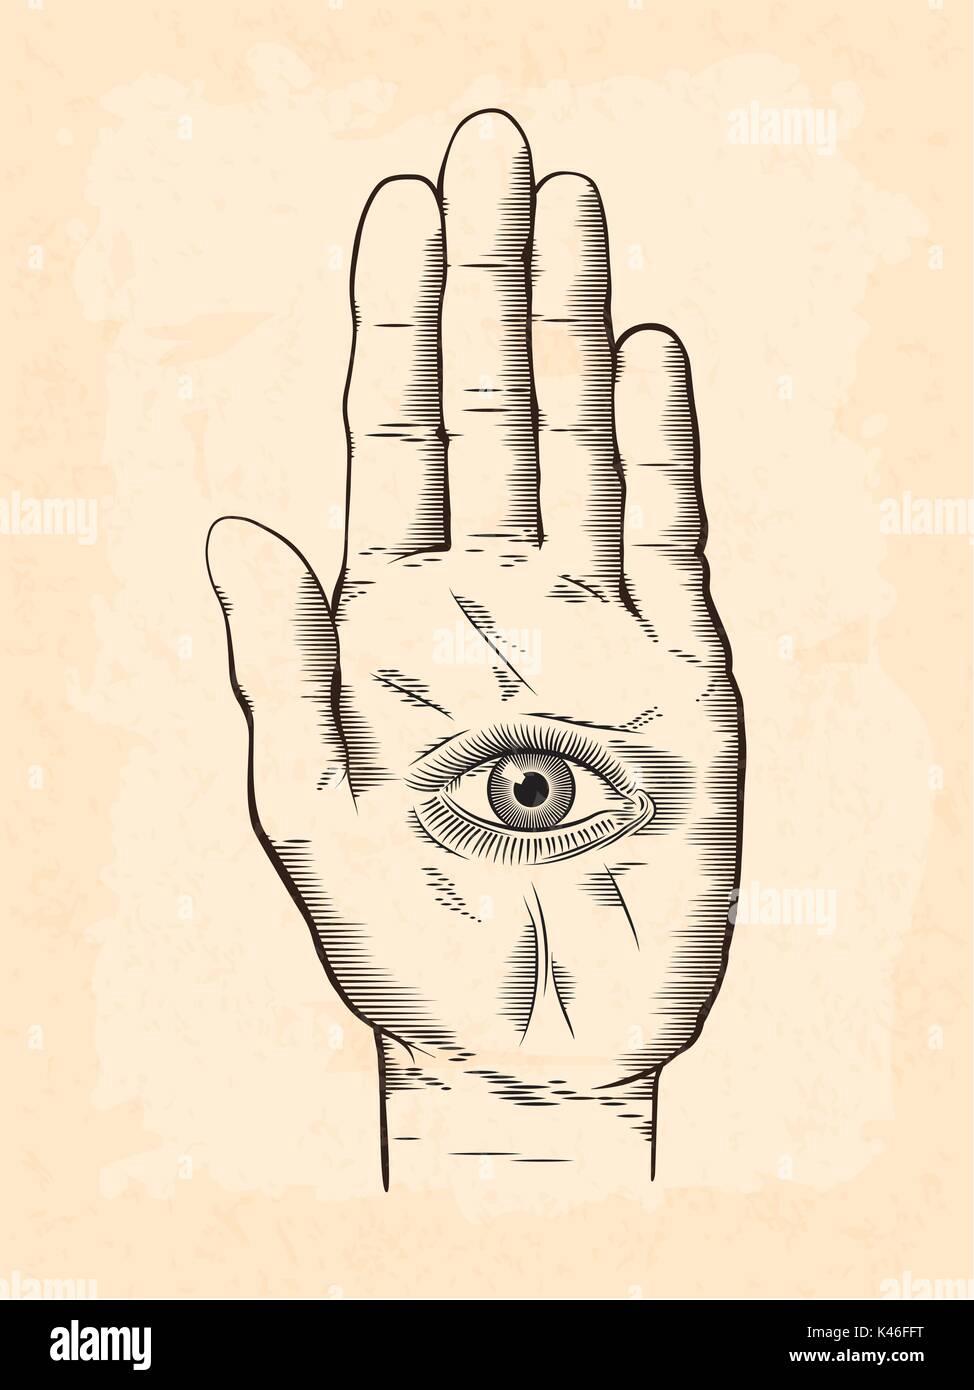 Vector Illustration Of Mystic Hamsa All Seeing Eye In Hand Symbol